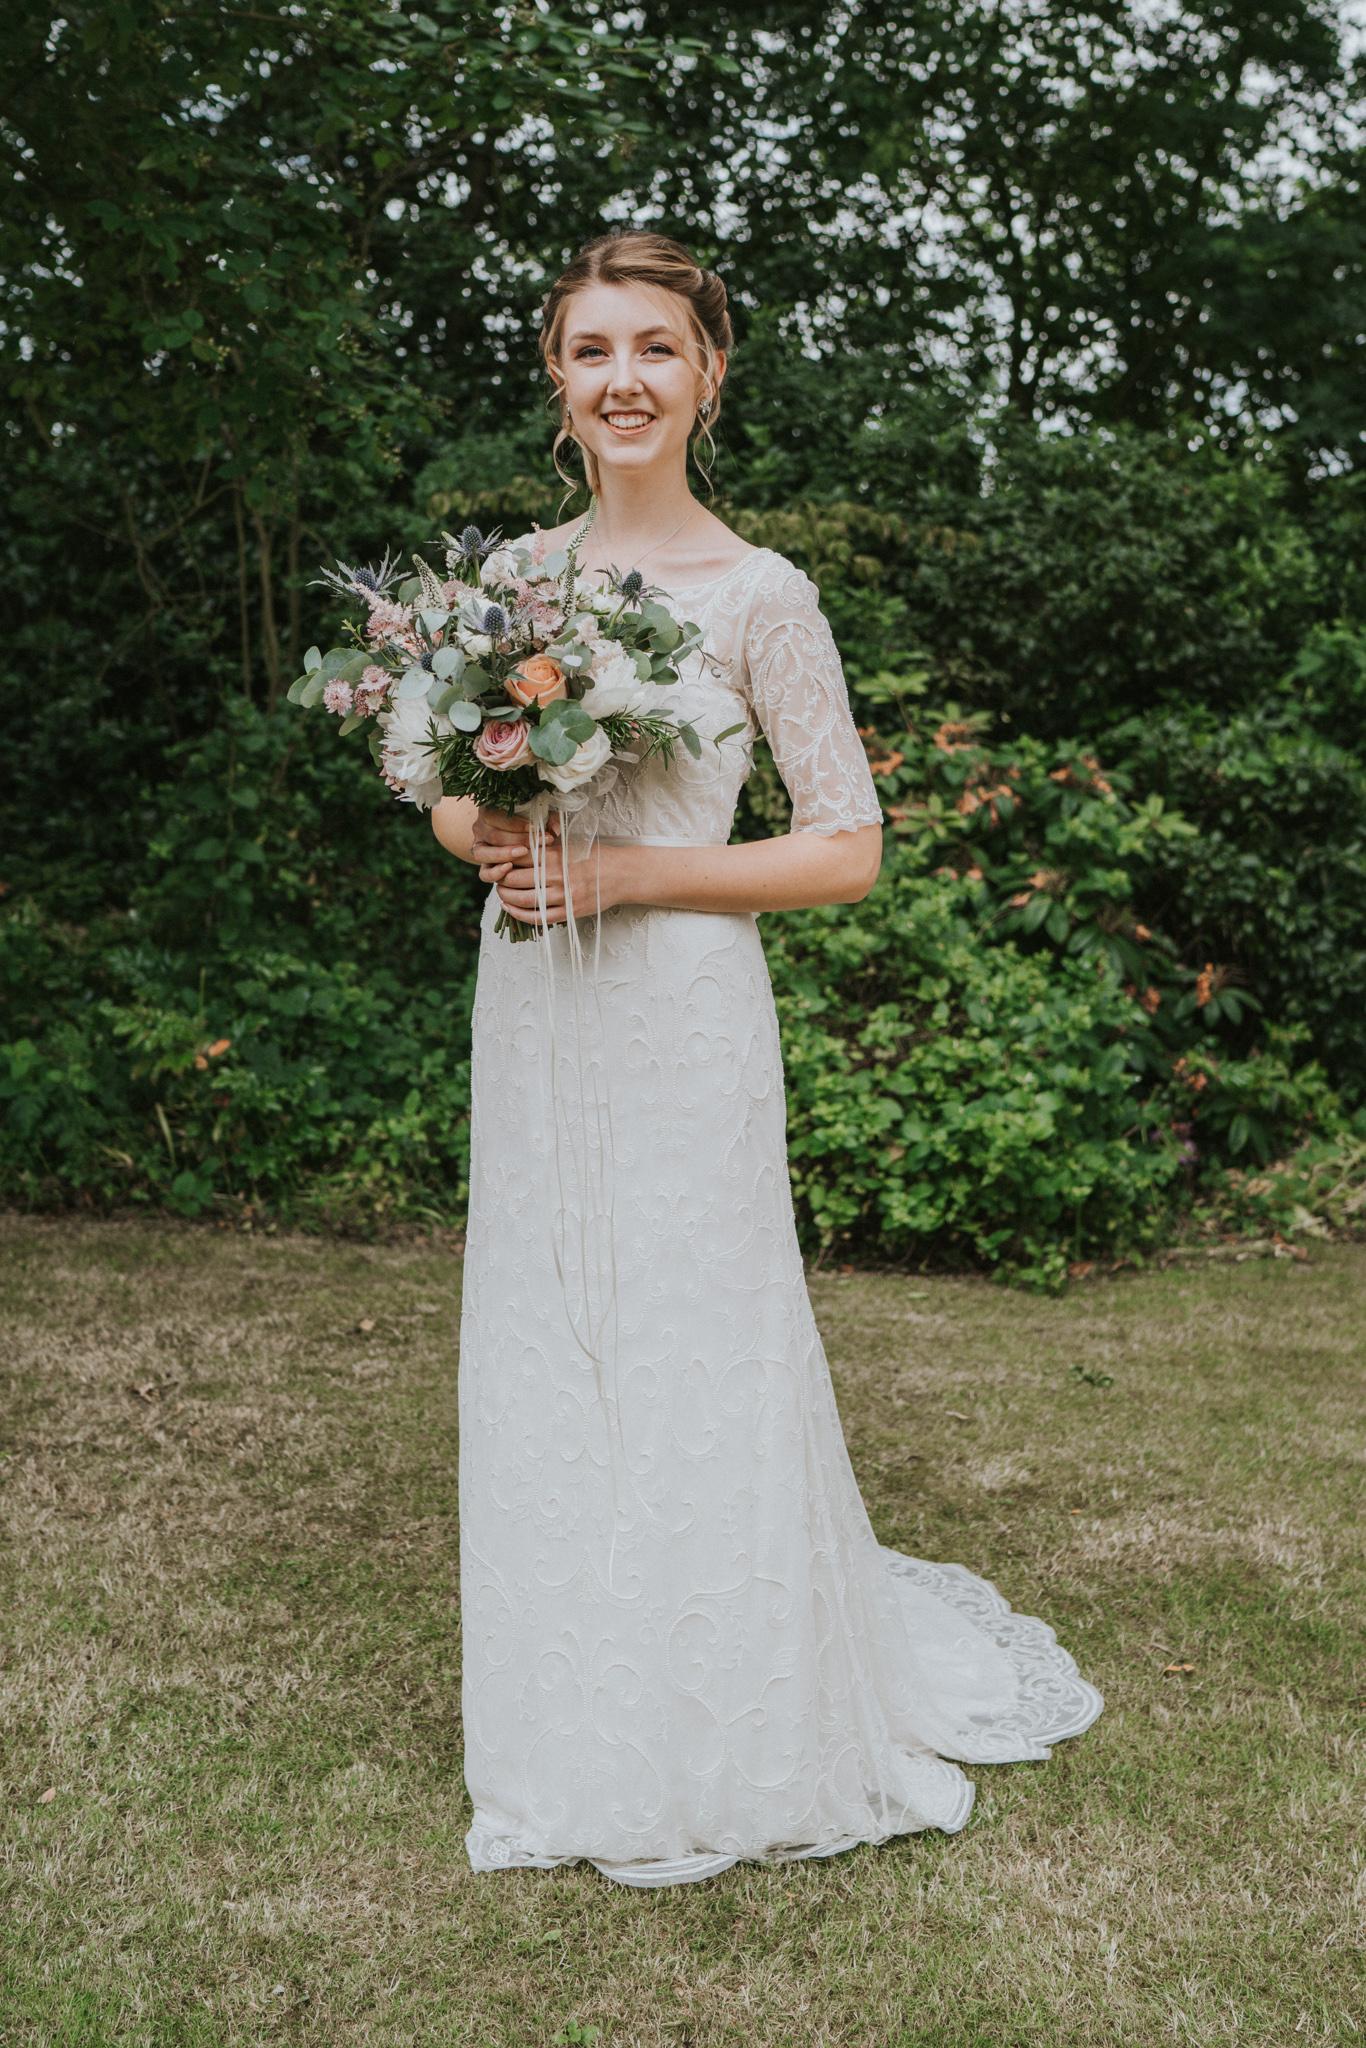 Jess-and-Tom-Norfolk-Alternative-Wedding-Essex-Wedding-Photographer-Grace-Elizabeth-7.jpg